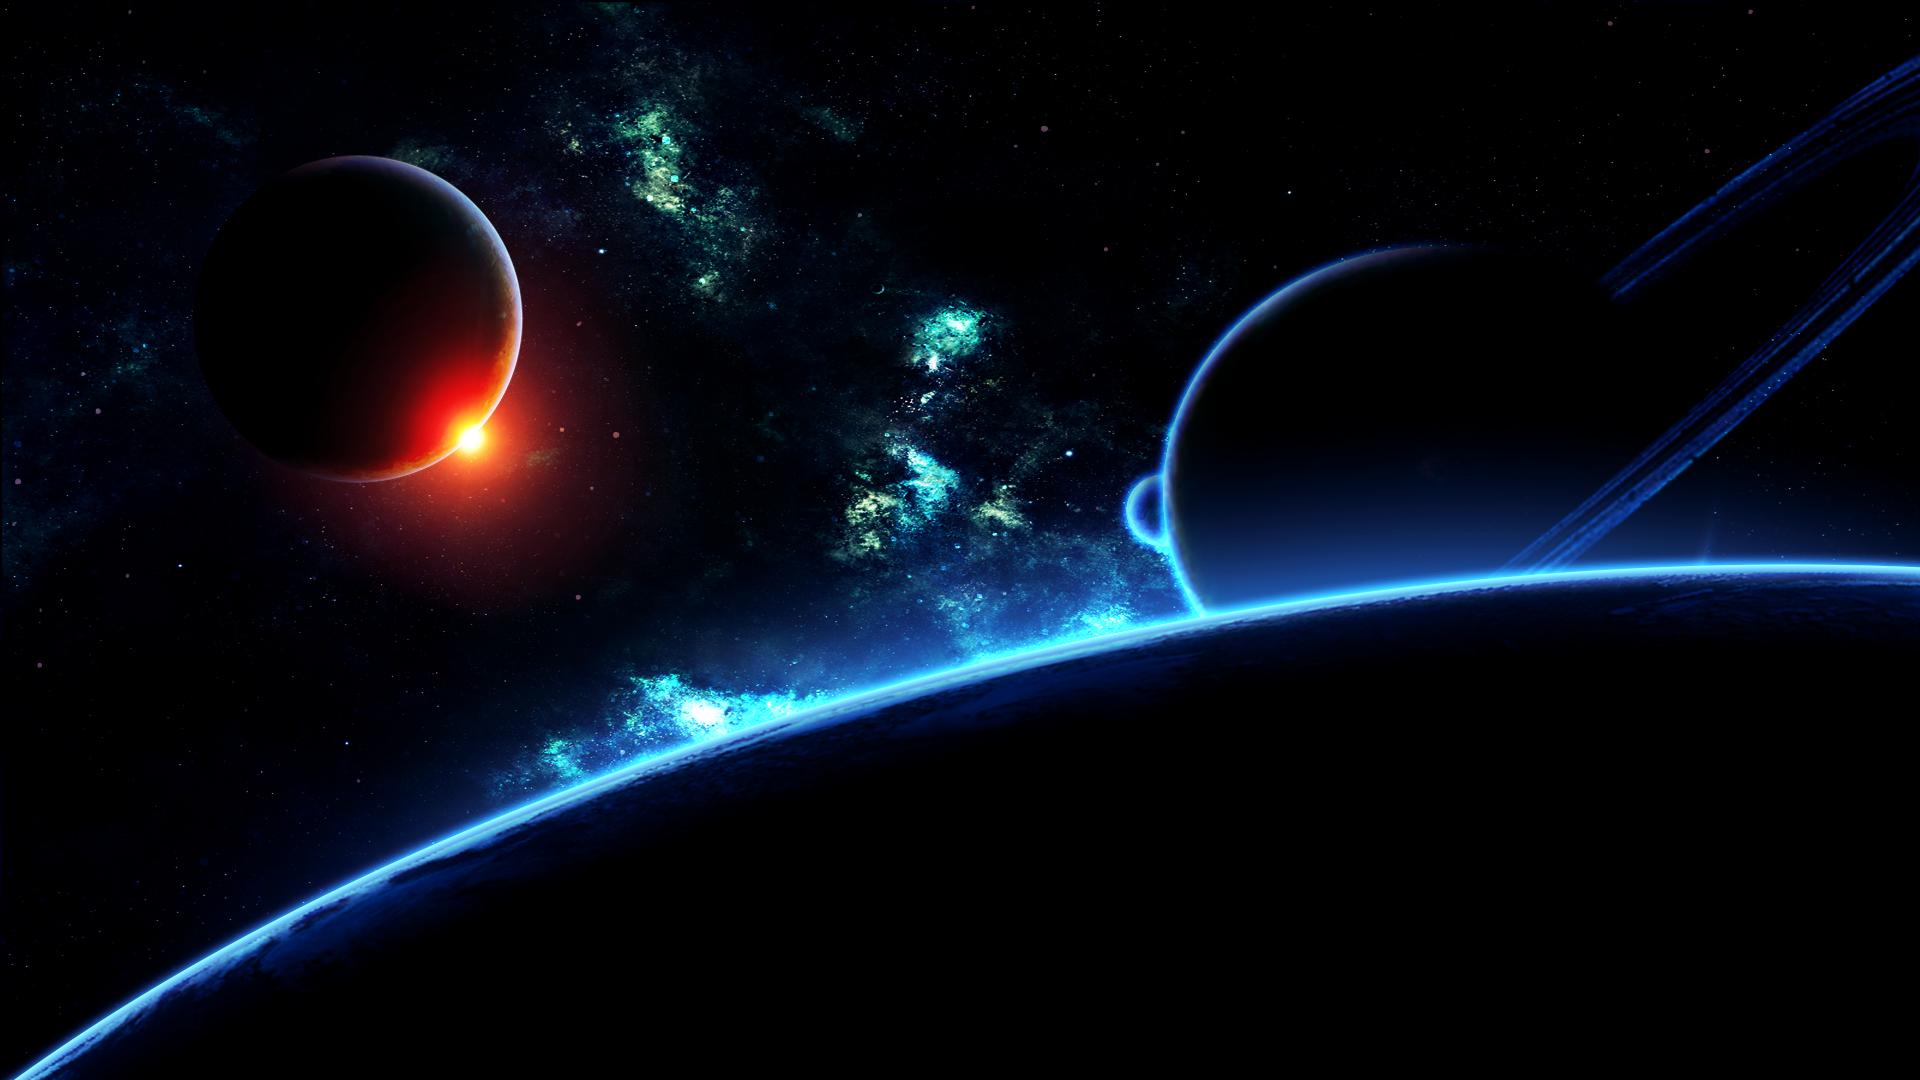 Deep Space Wallpaper HD